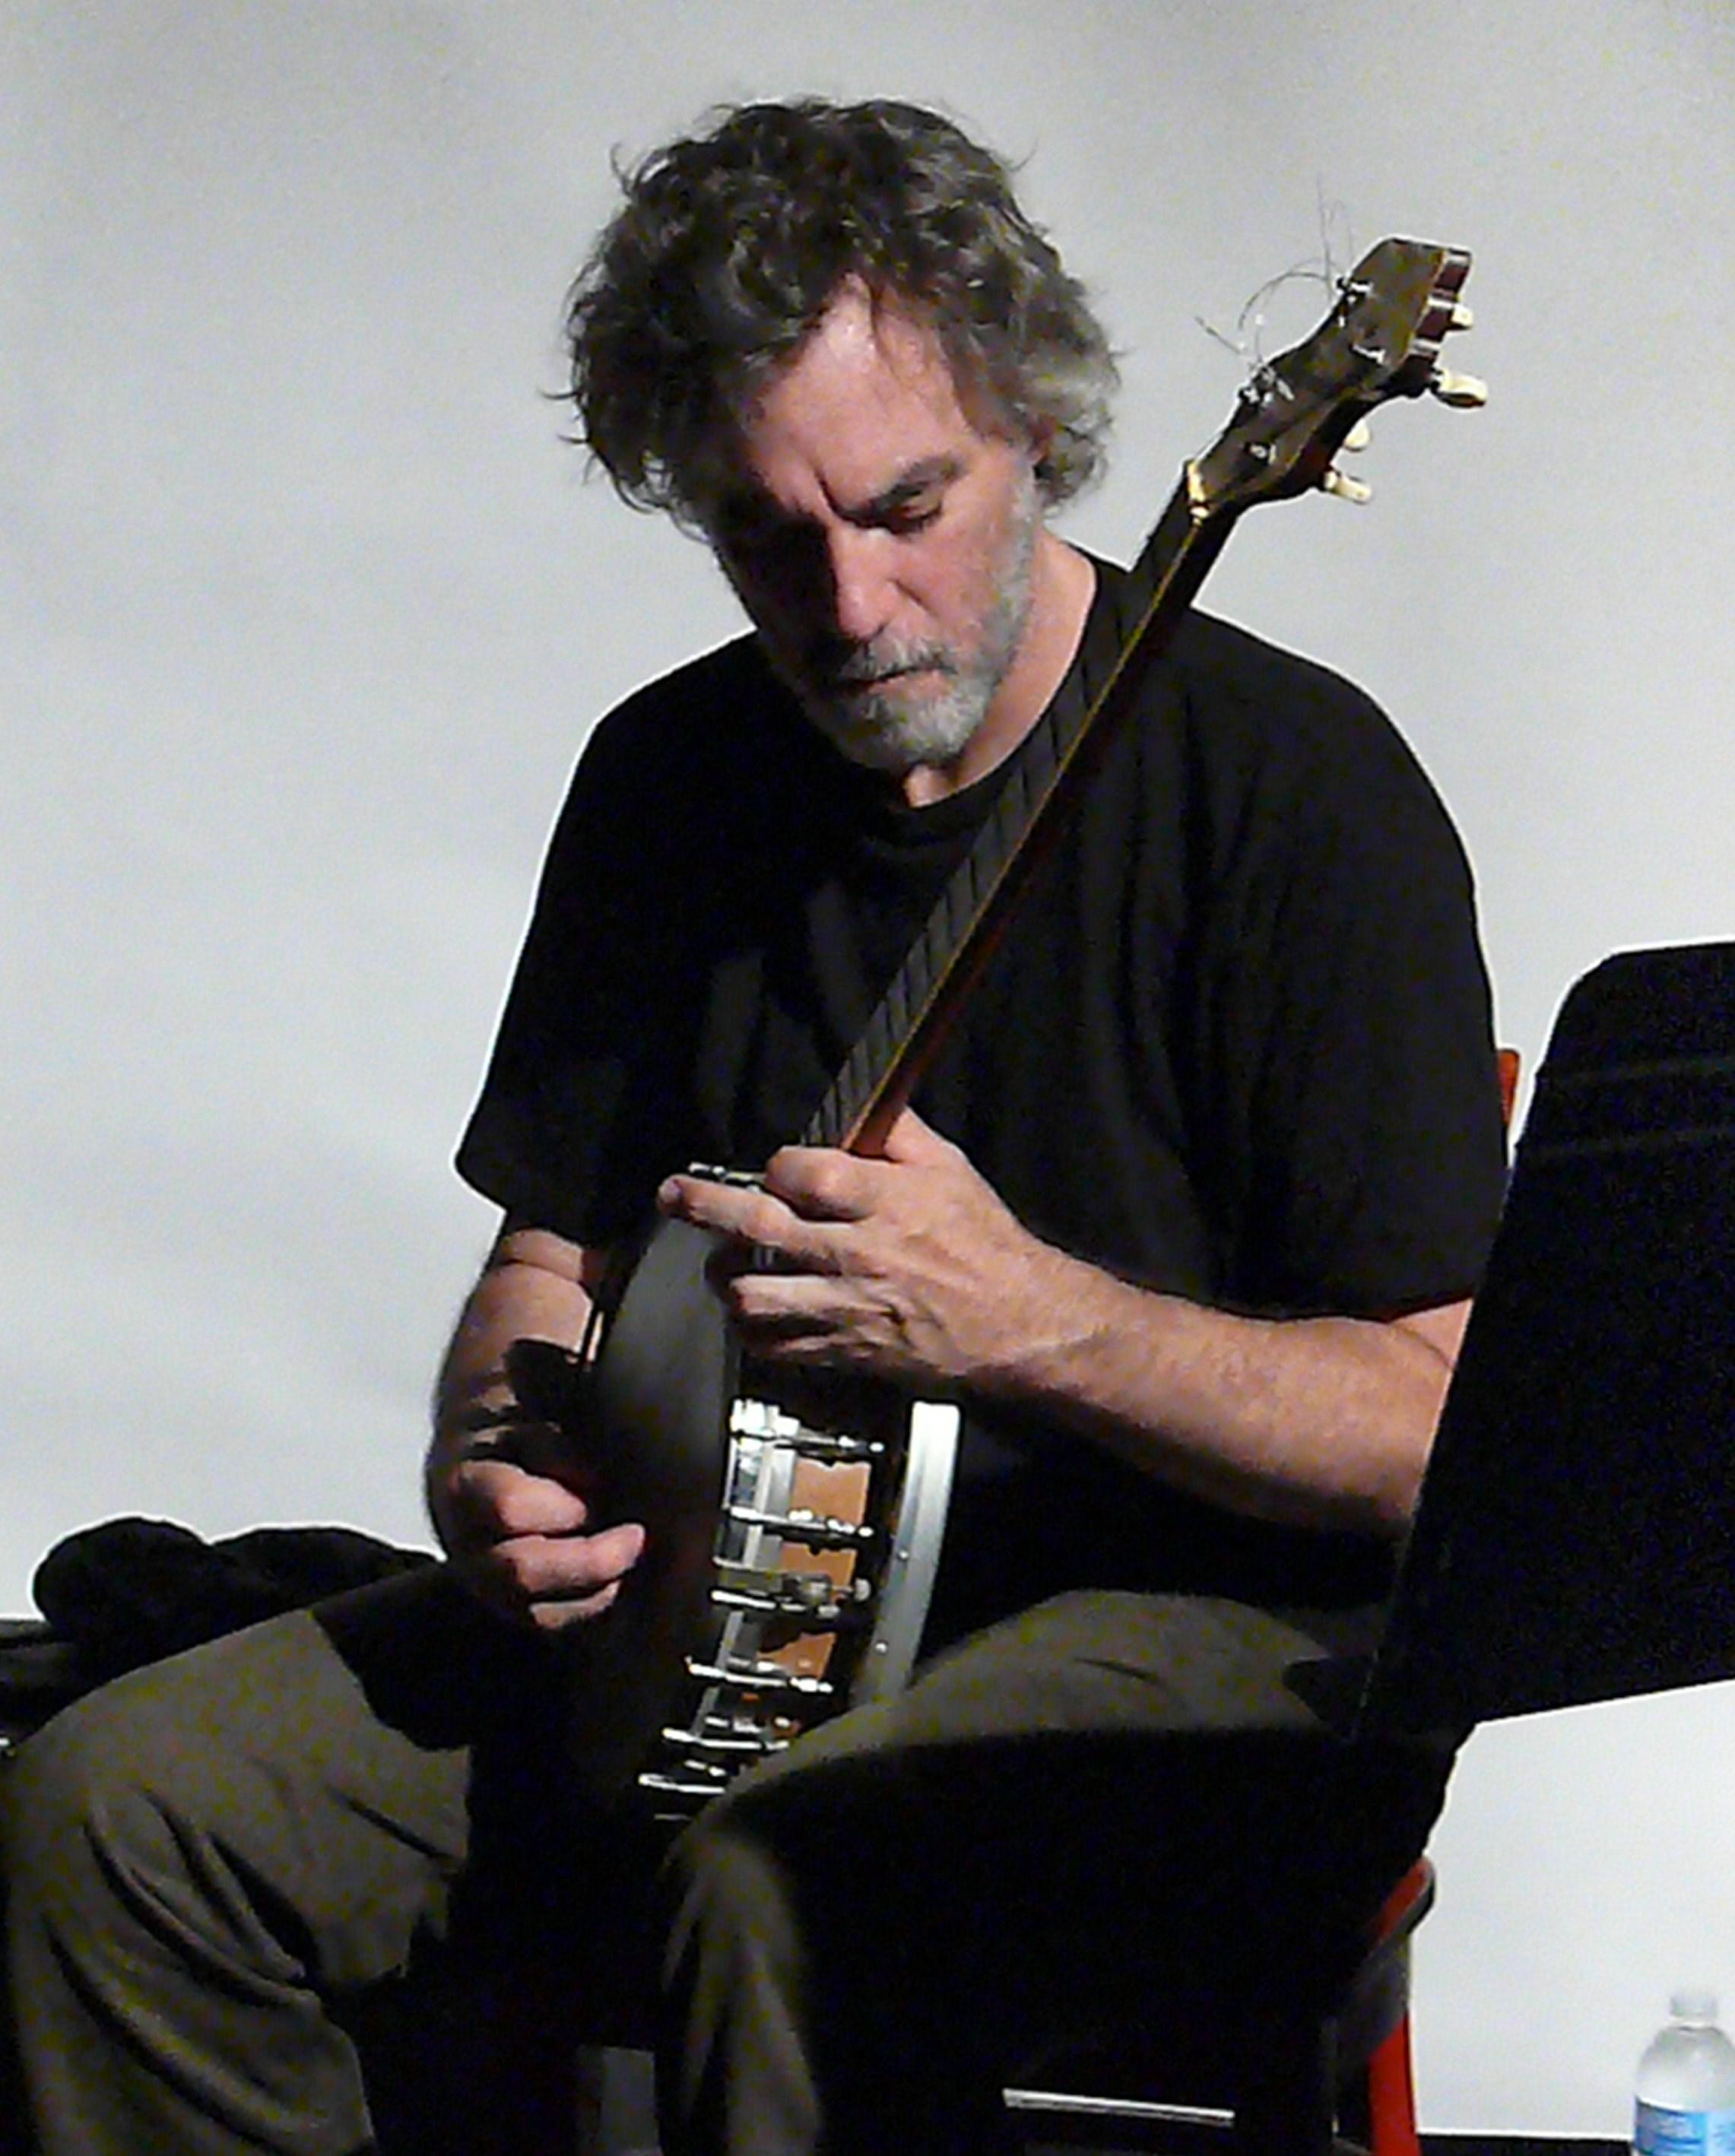 Joe Morris at the 2010 Vision Festival in New York